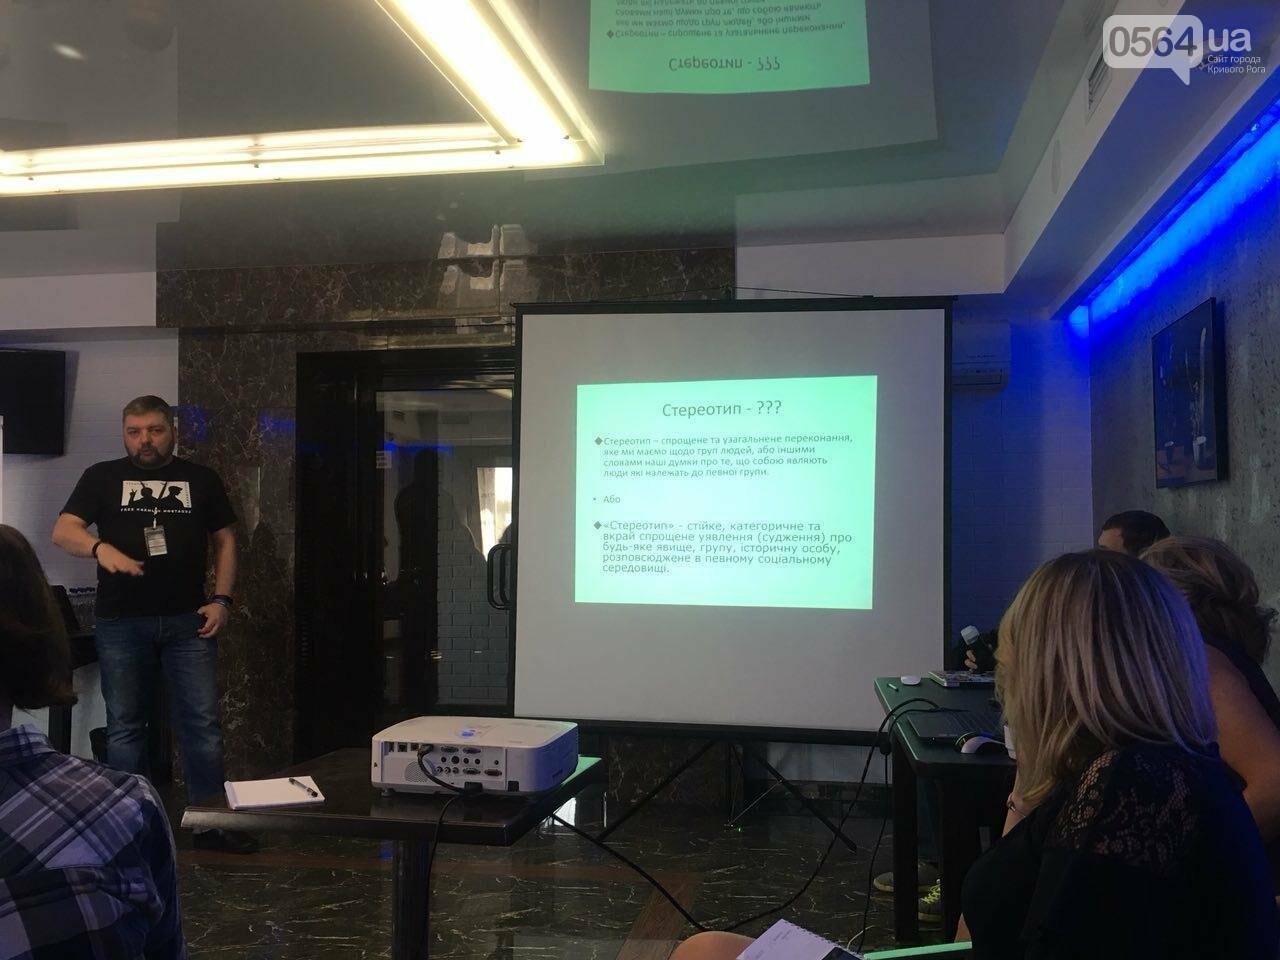 На тренинге о ВИЧ и медреформе криворожским журналистам рассказали о дискриминации и стереотипах, - ФОТО , фото-14